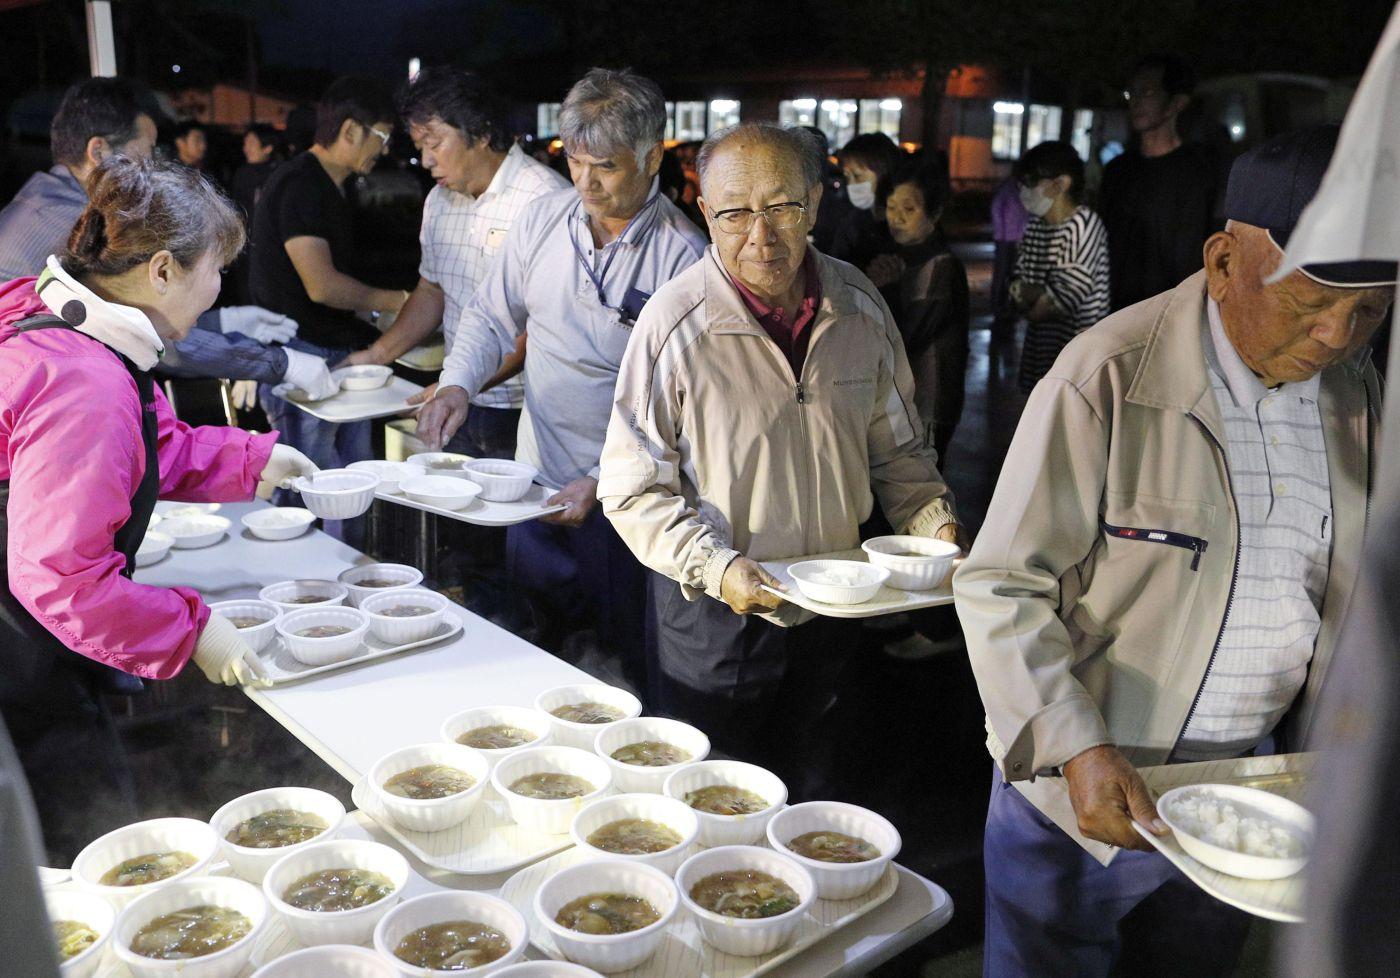 'Treasures of Our Town': Atsuma Pays Tribute to 36 Killed in Hokkaido Earthquake